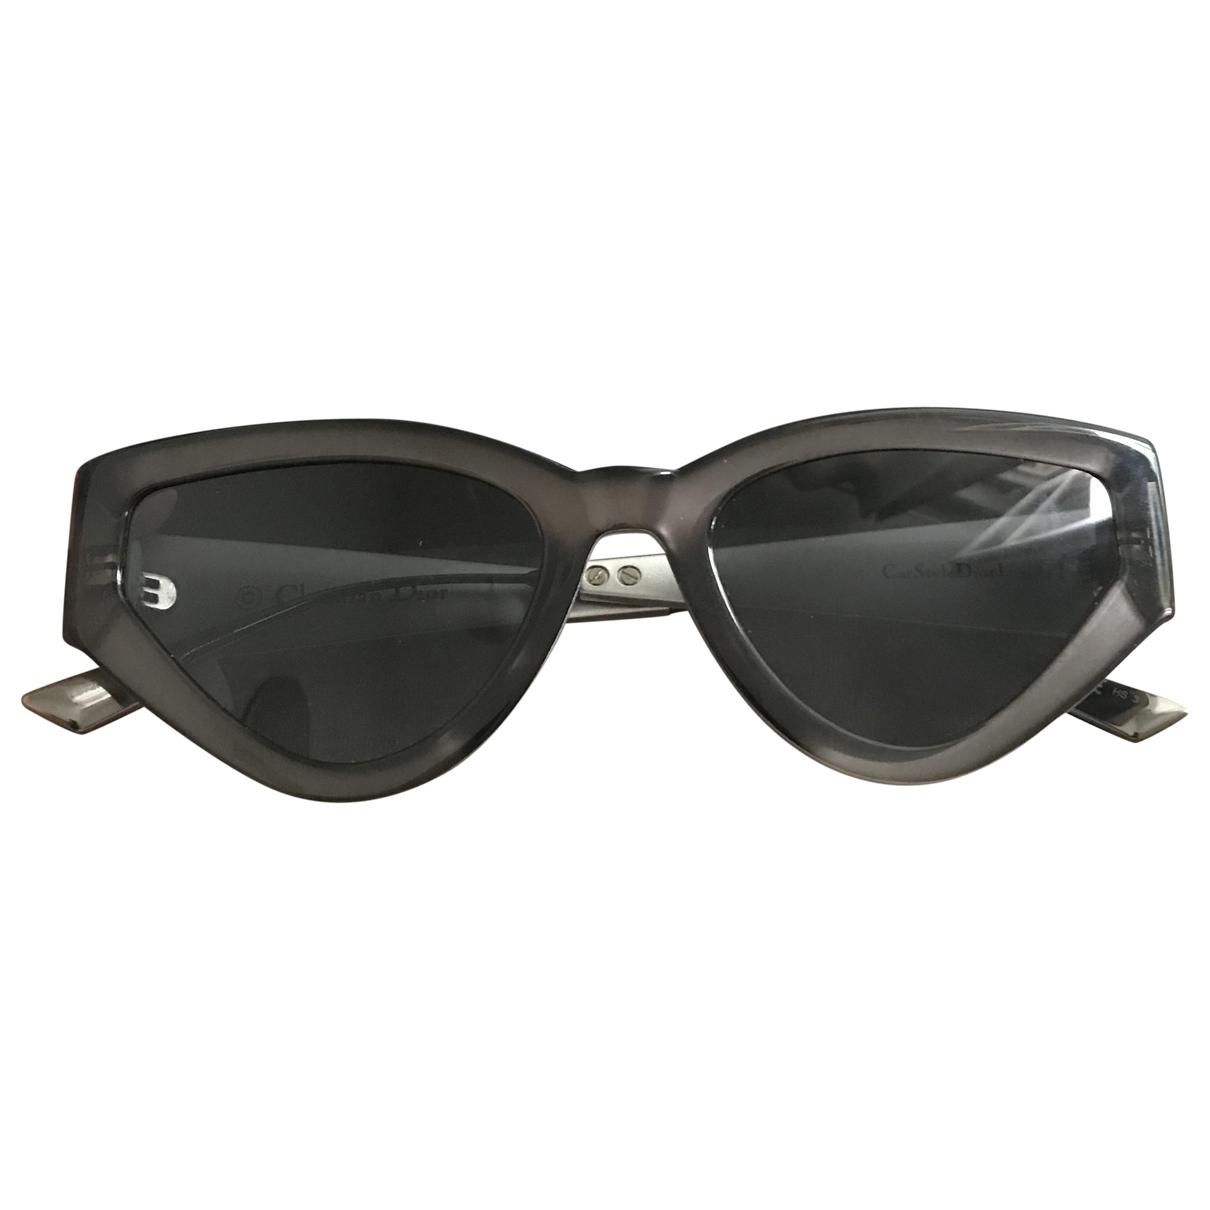 Gafas CatstyleDior1 Dior